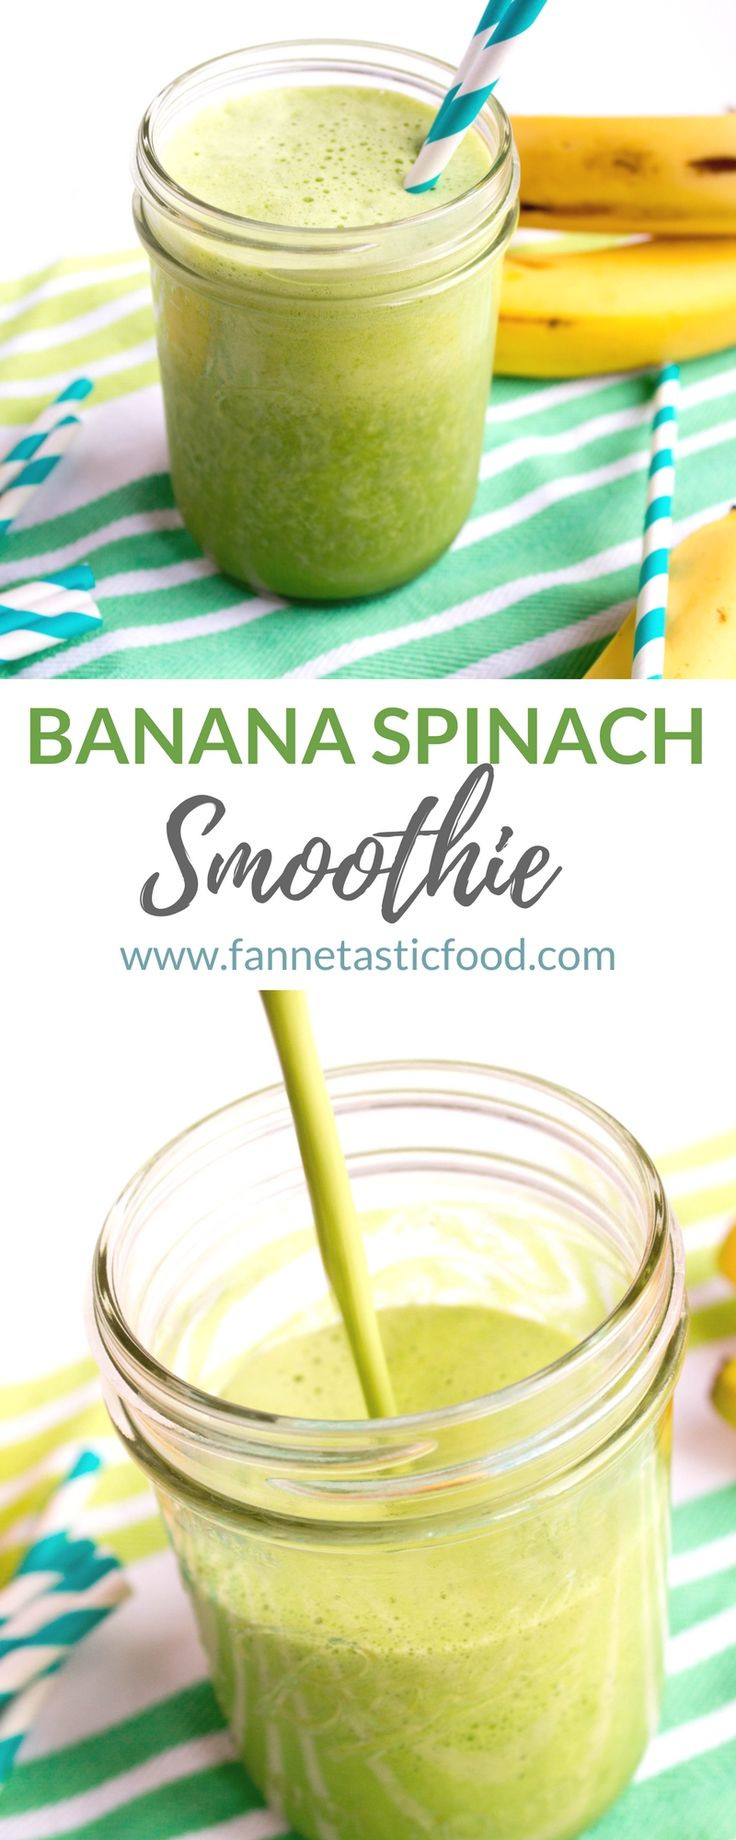 Healthy Smoothies For Diabetics  Best 25 Diabetic smoothies ideas on Pinterest